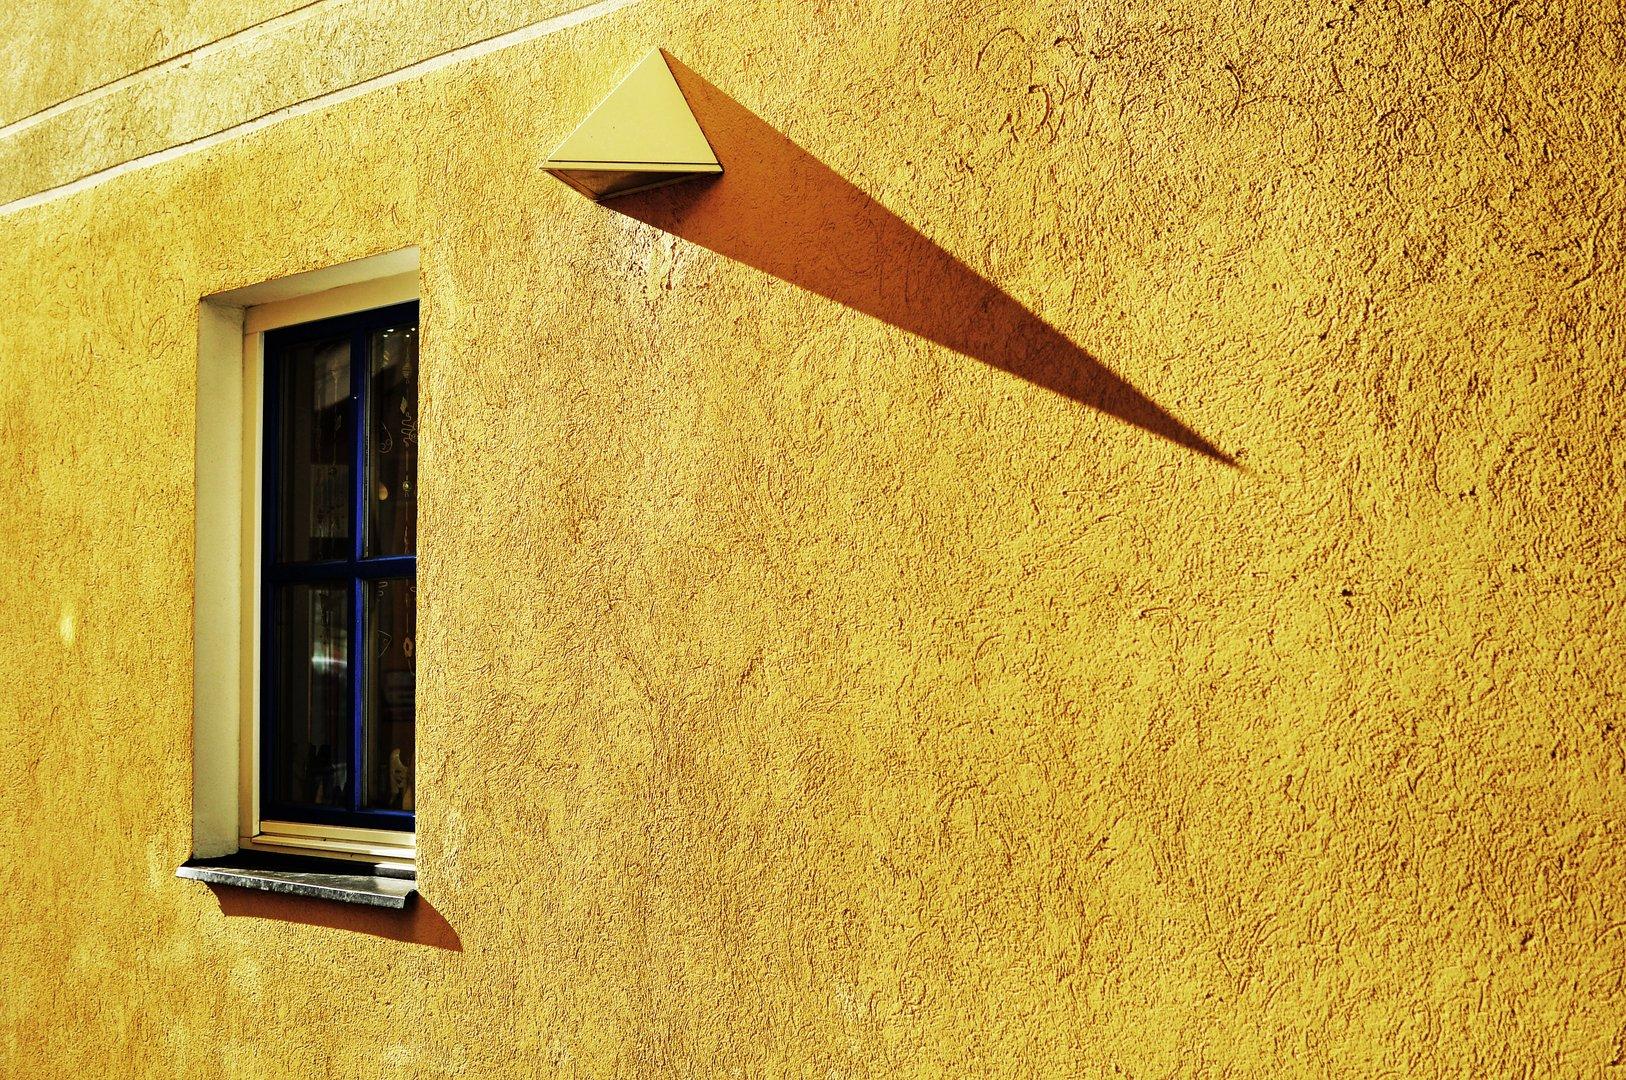 Fenster & Schatten